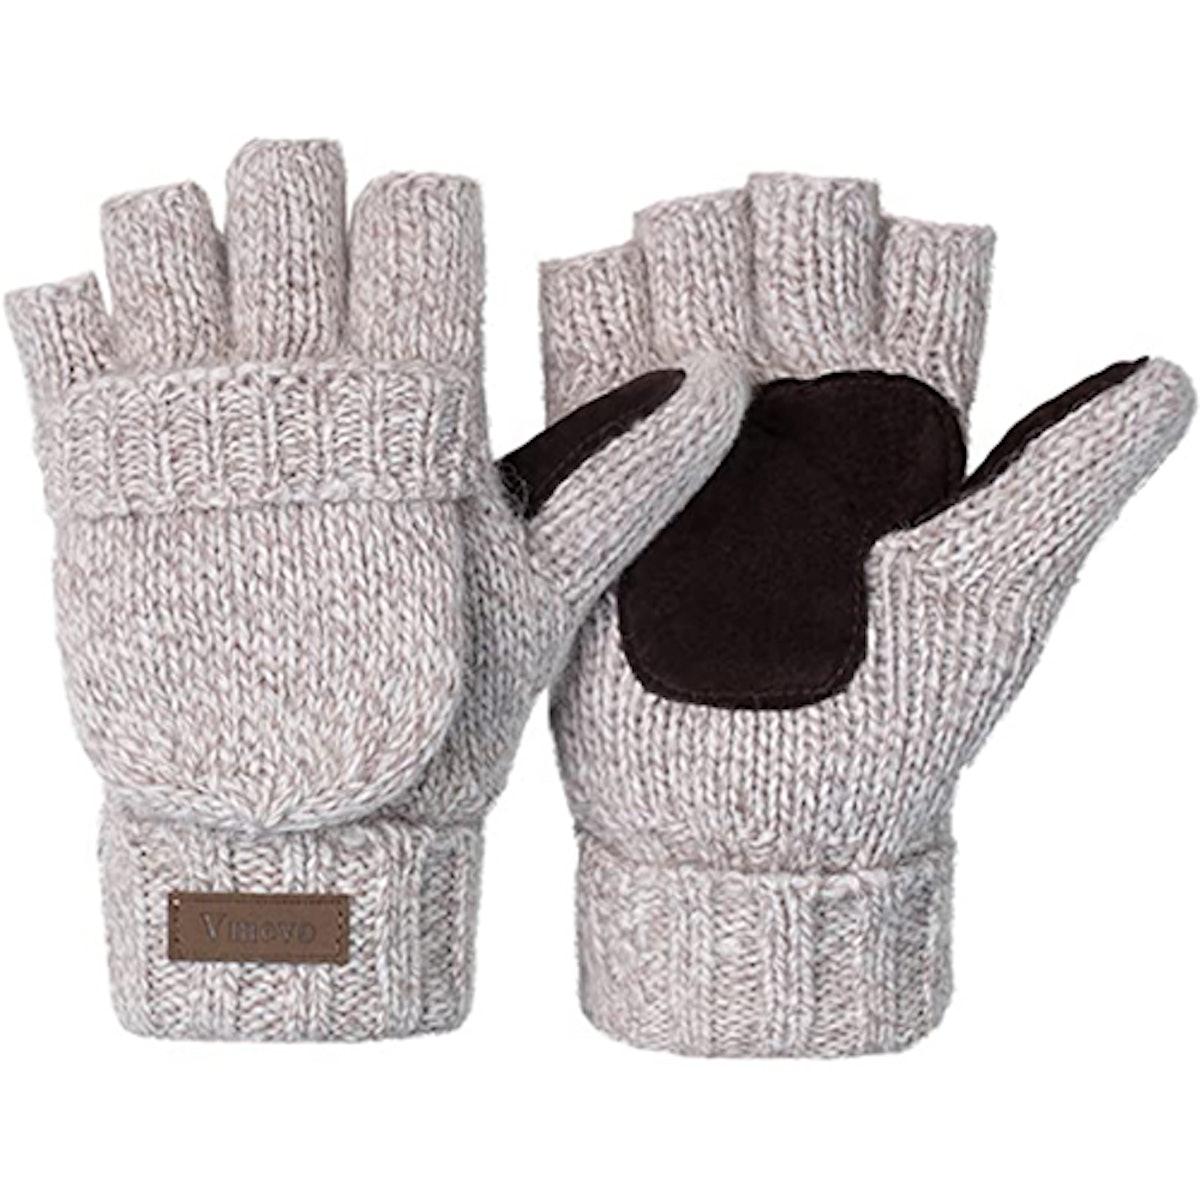 Vigrace Knitted Convertible Fingerless Gloves